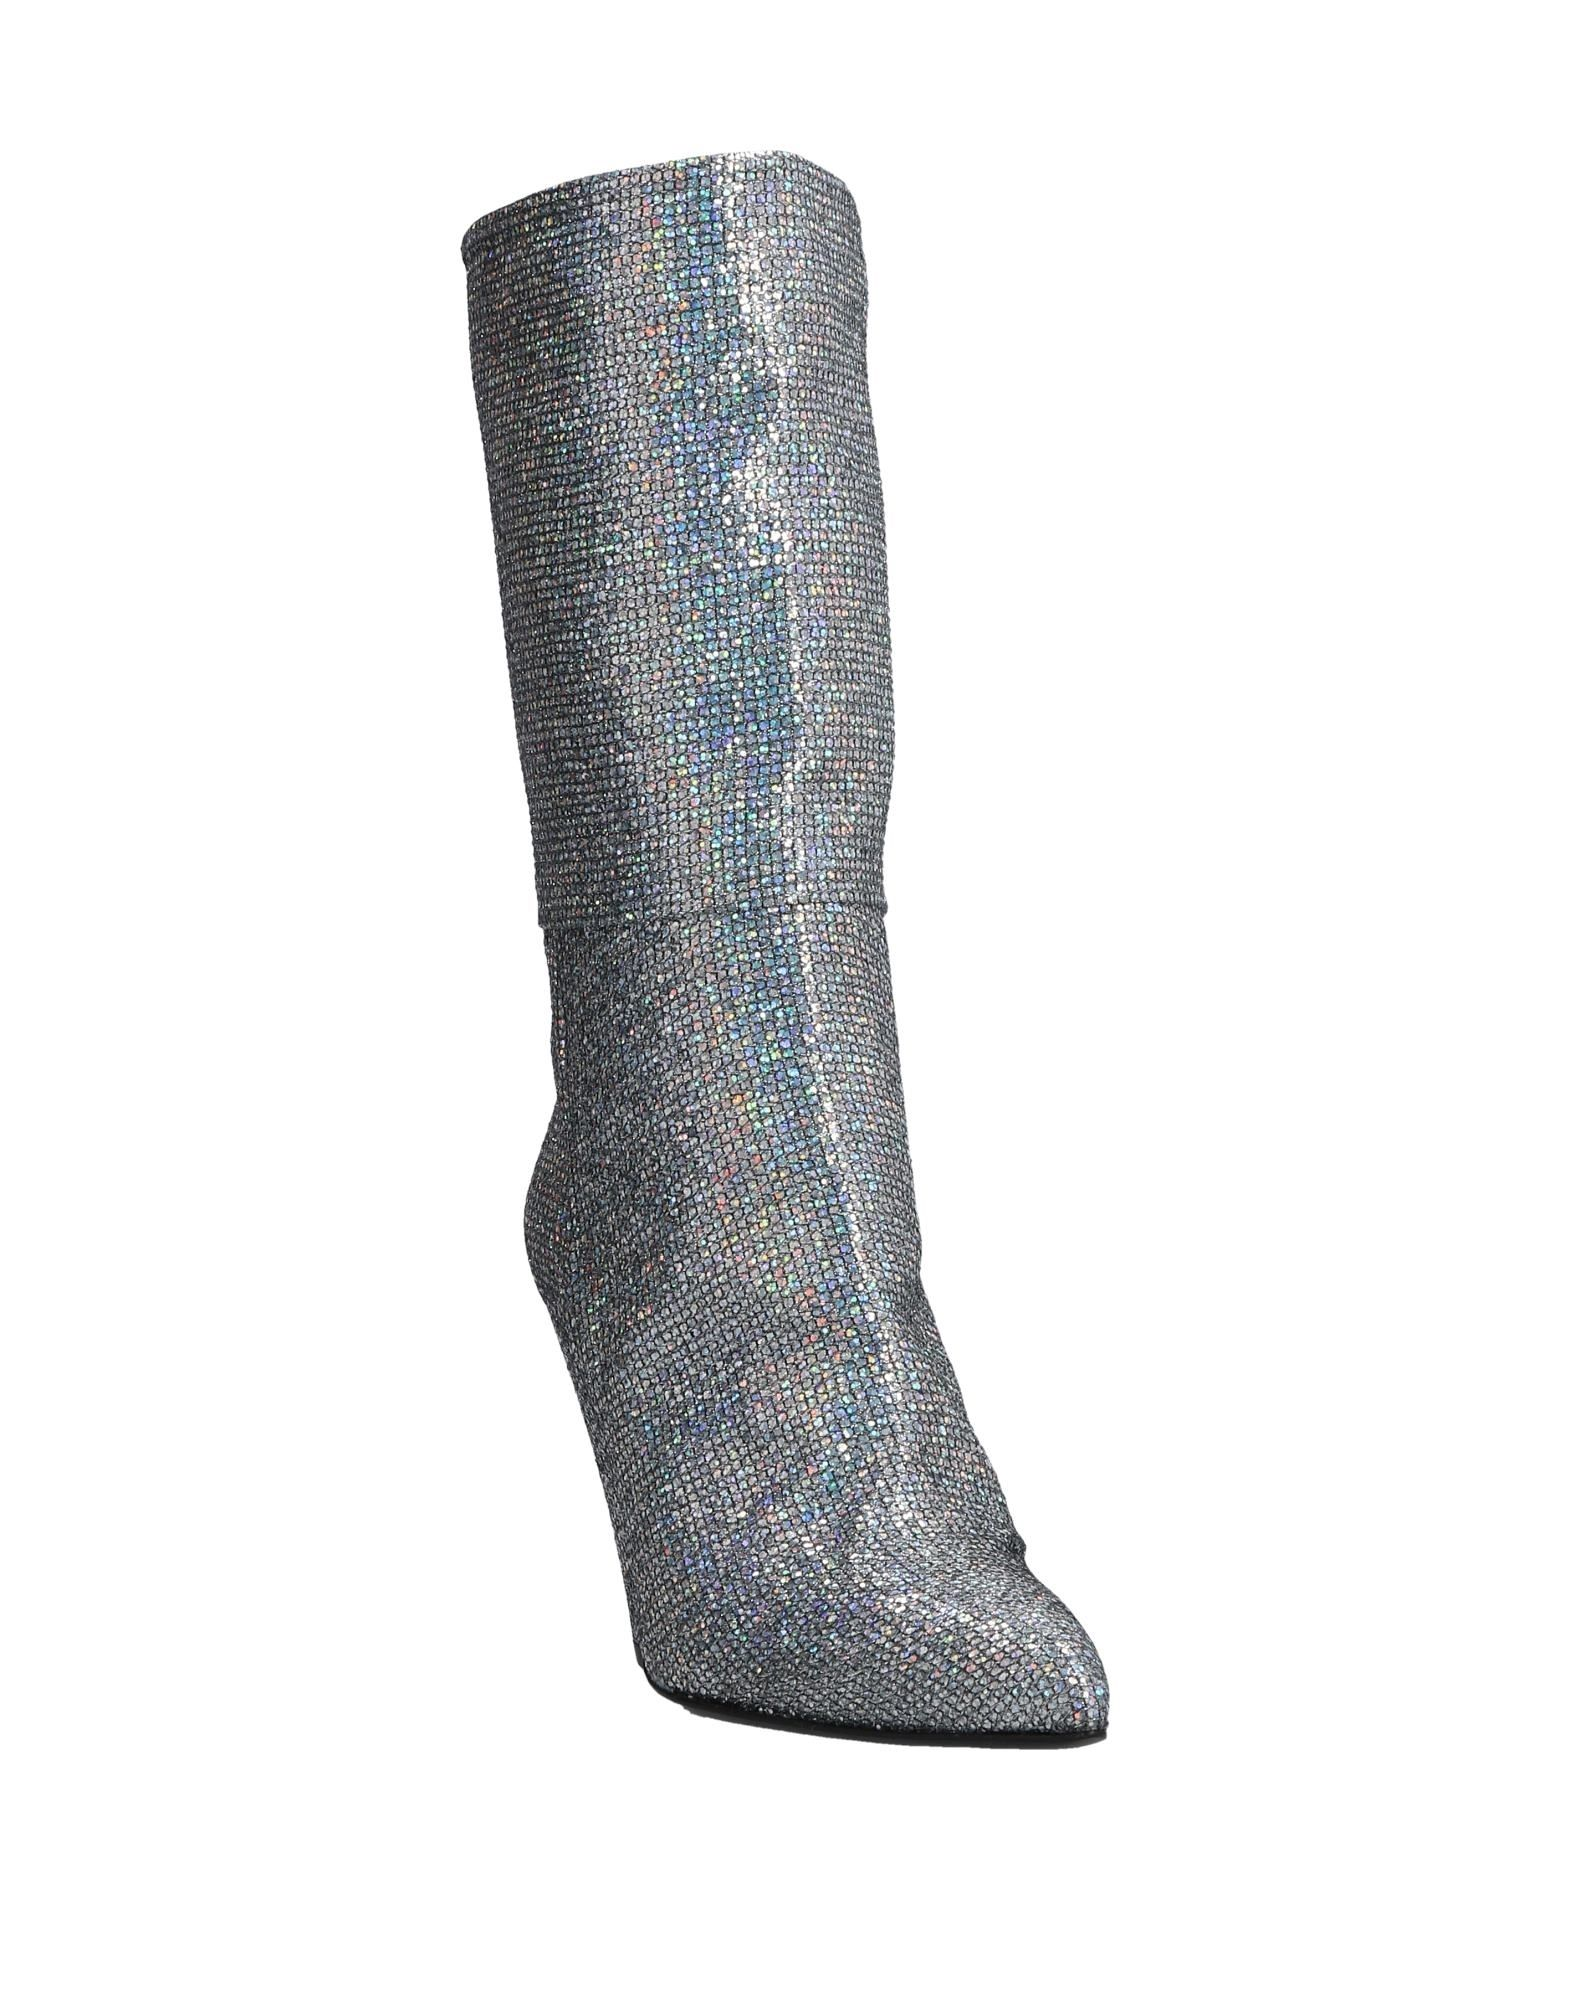 Stilvolle billige Schuhe Giampaolo Viozzi Stiefel Damen  11532958LF 11532958LF 11532958LF 51d761